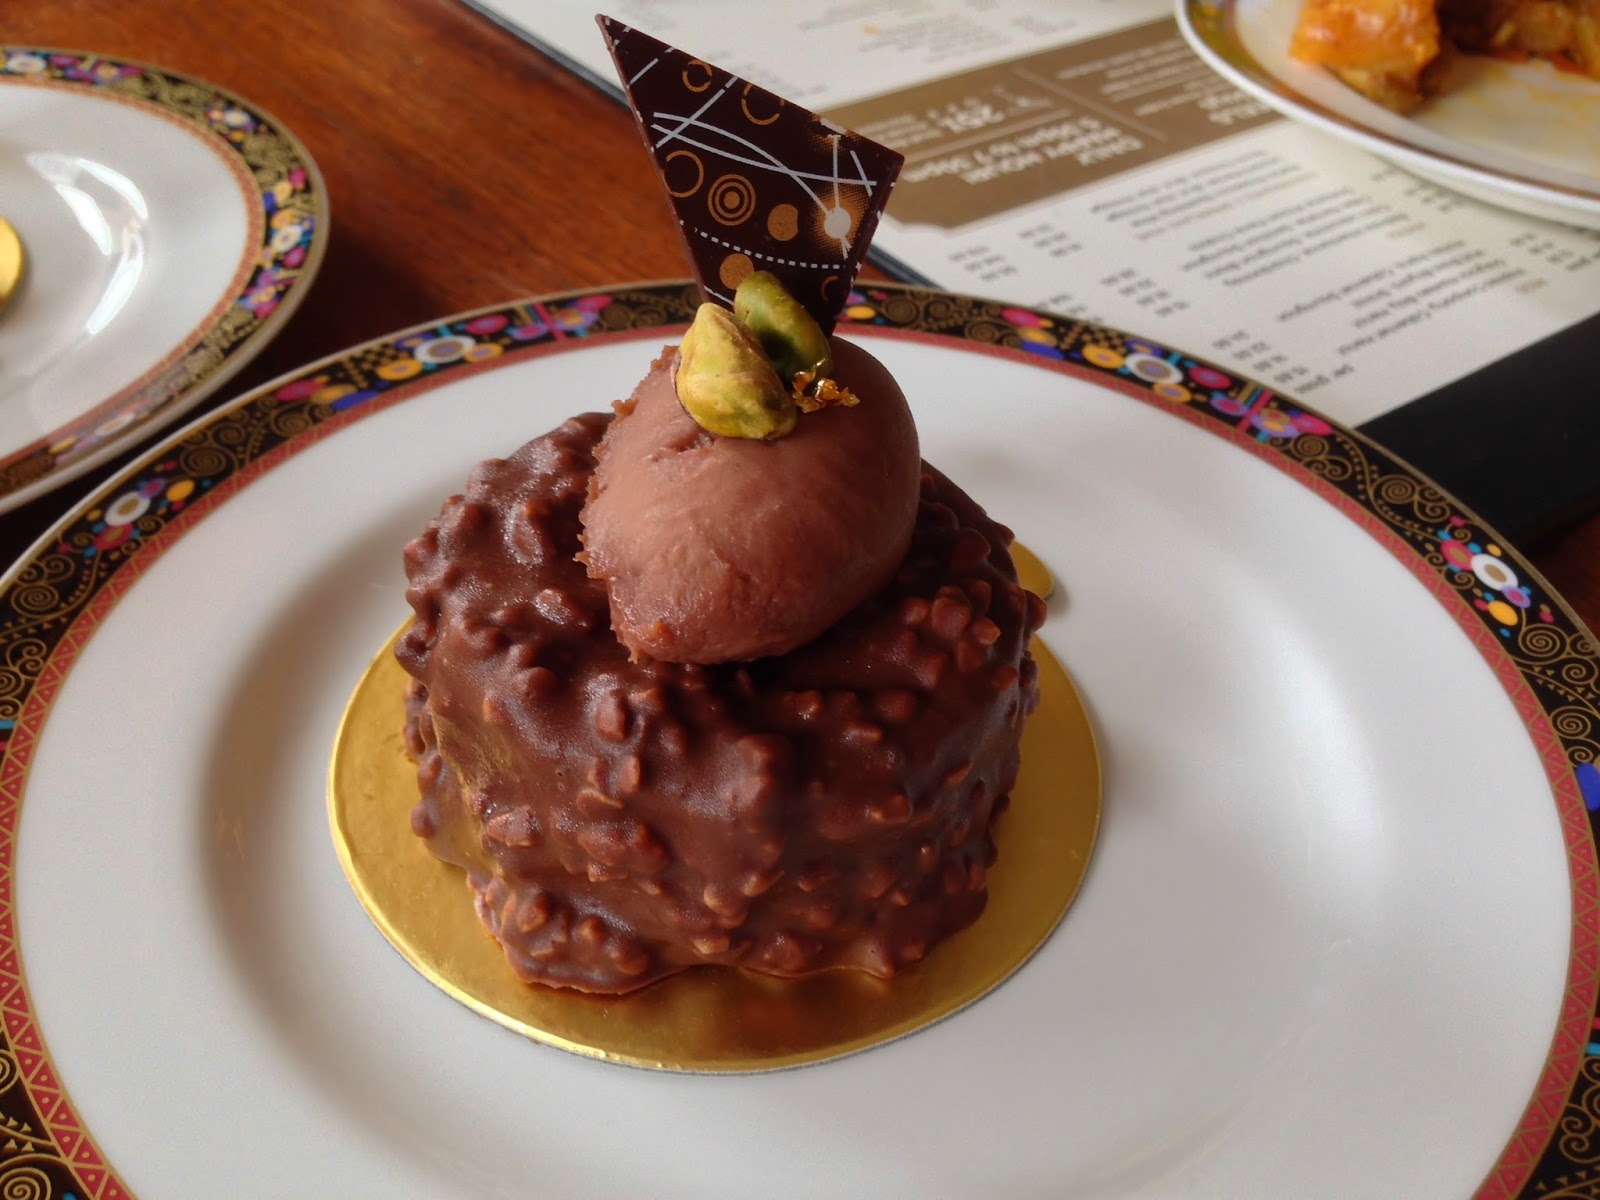 Glazed Macadamia Chocolate Fondant